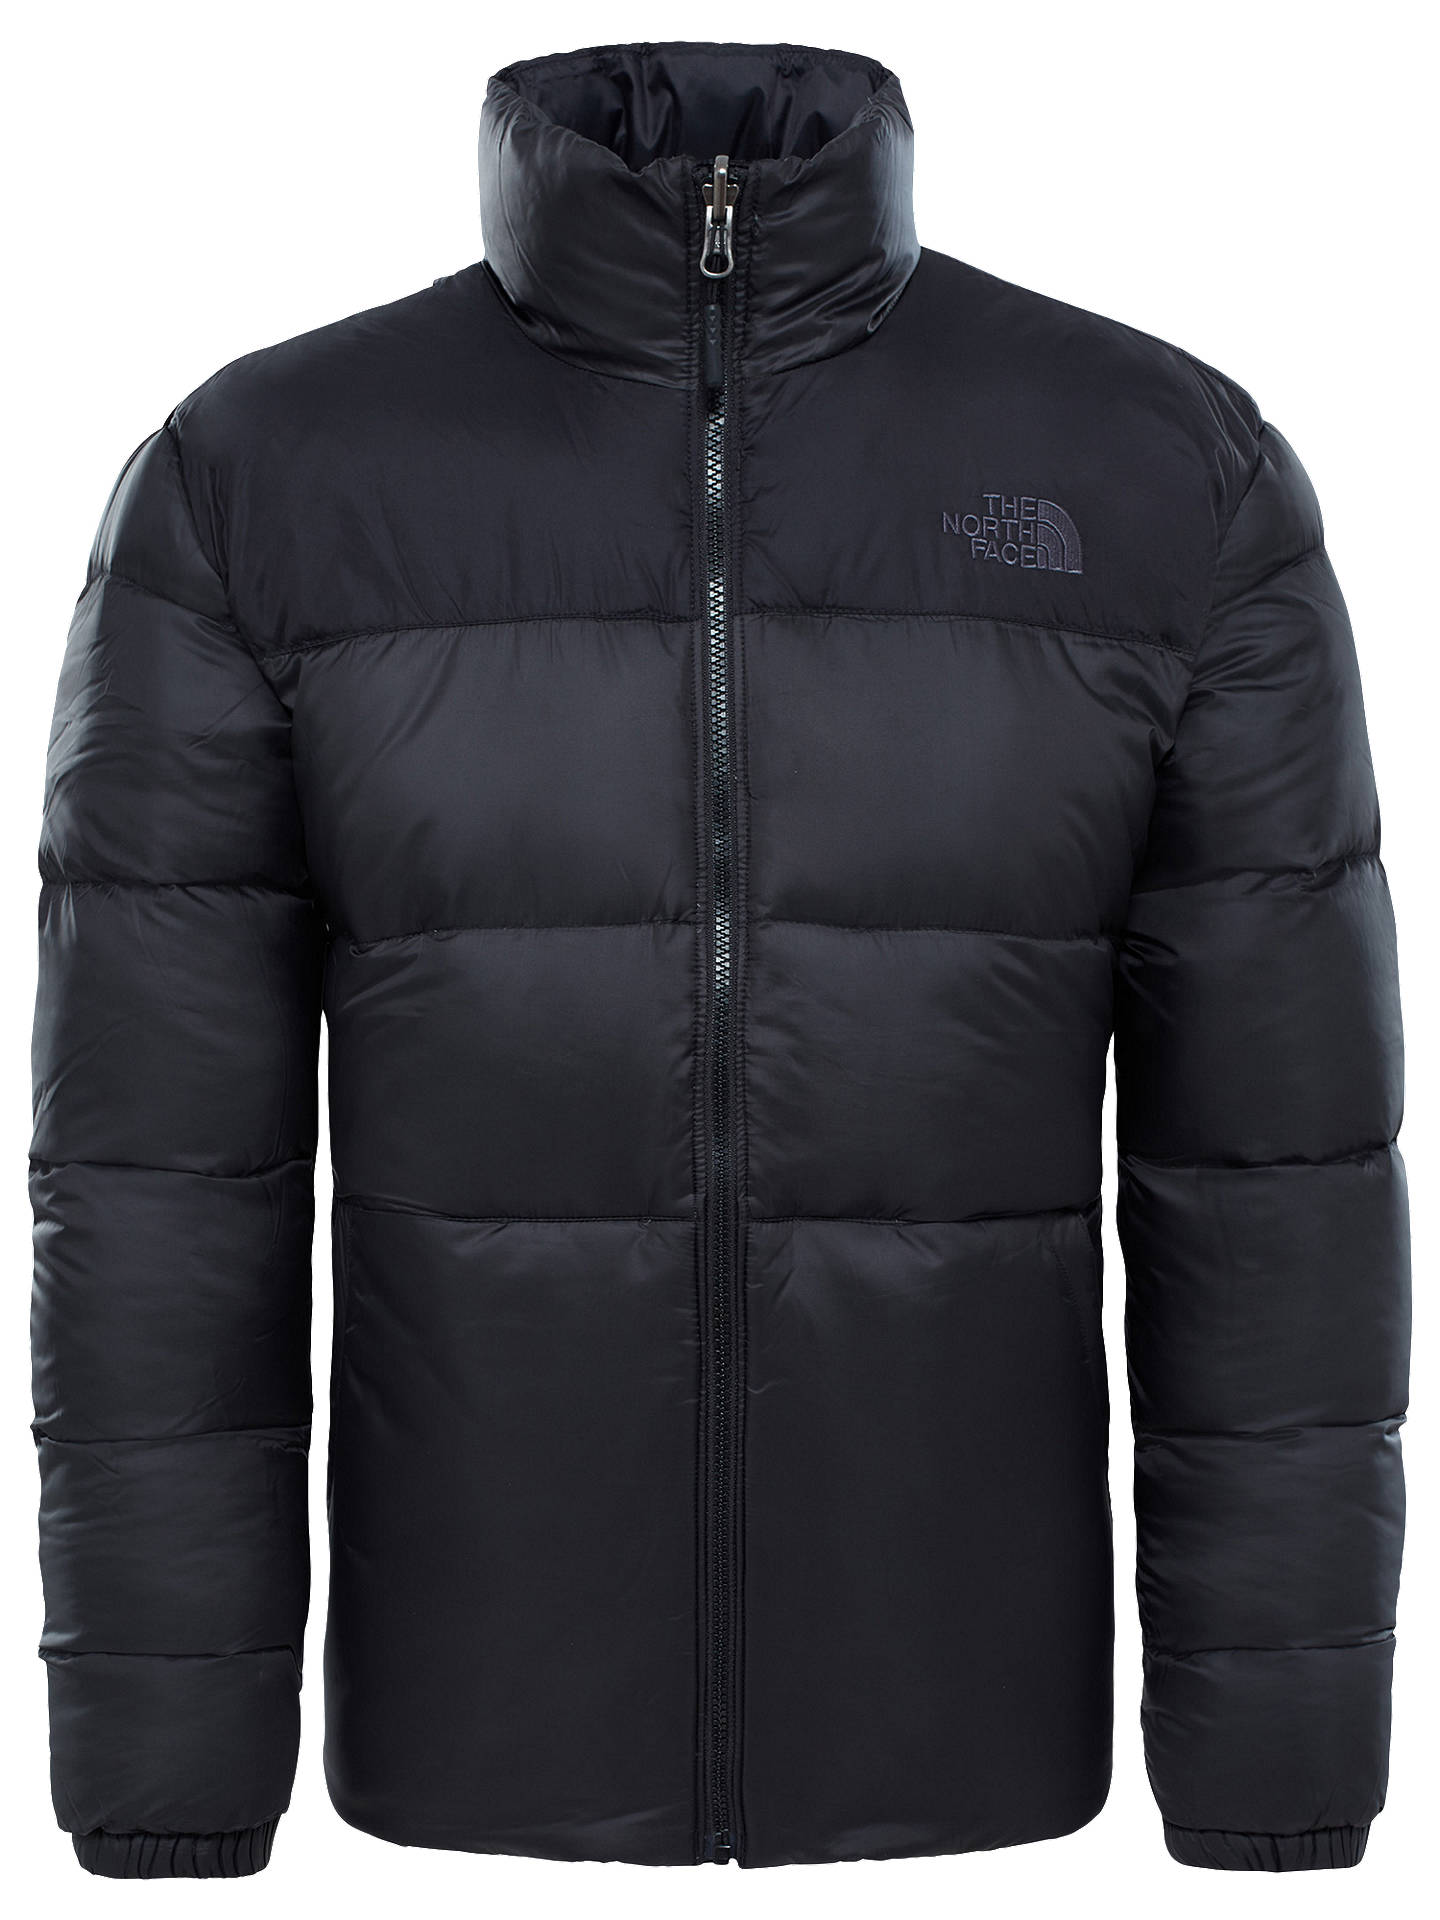 BuyThe North Face Nuptse 3 Men s Jacket cd88c3bb4